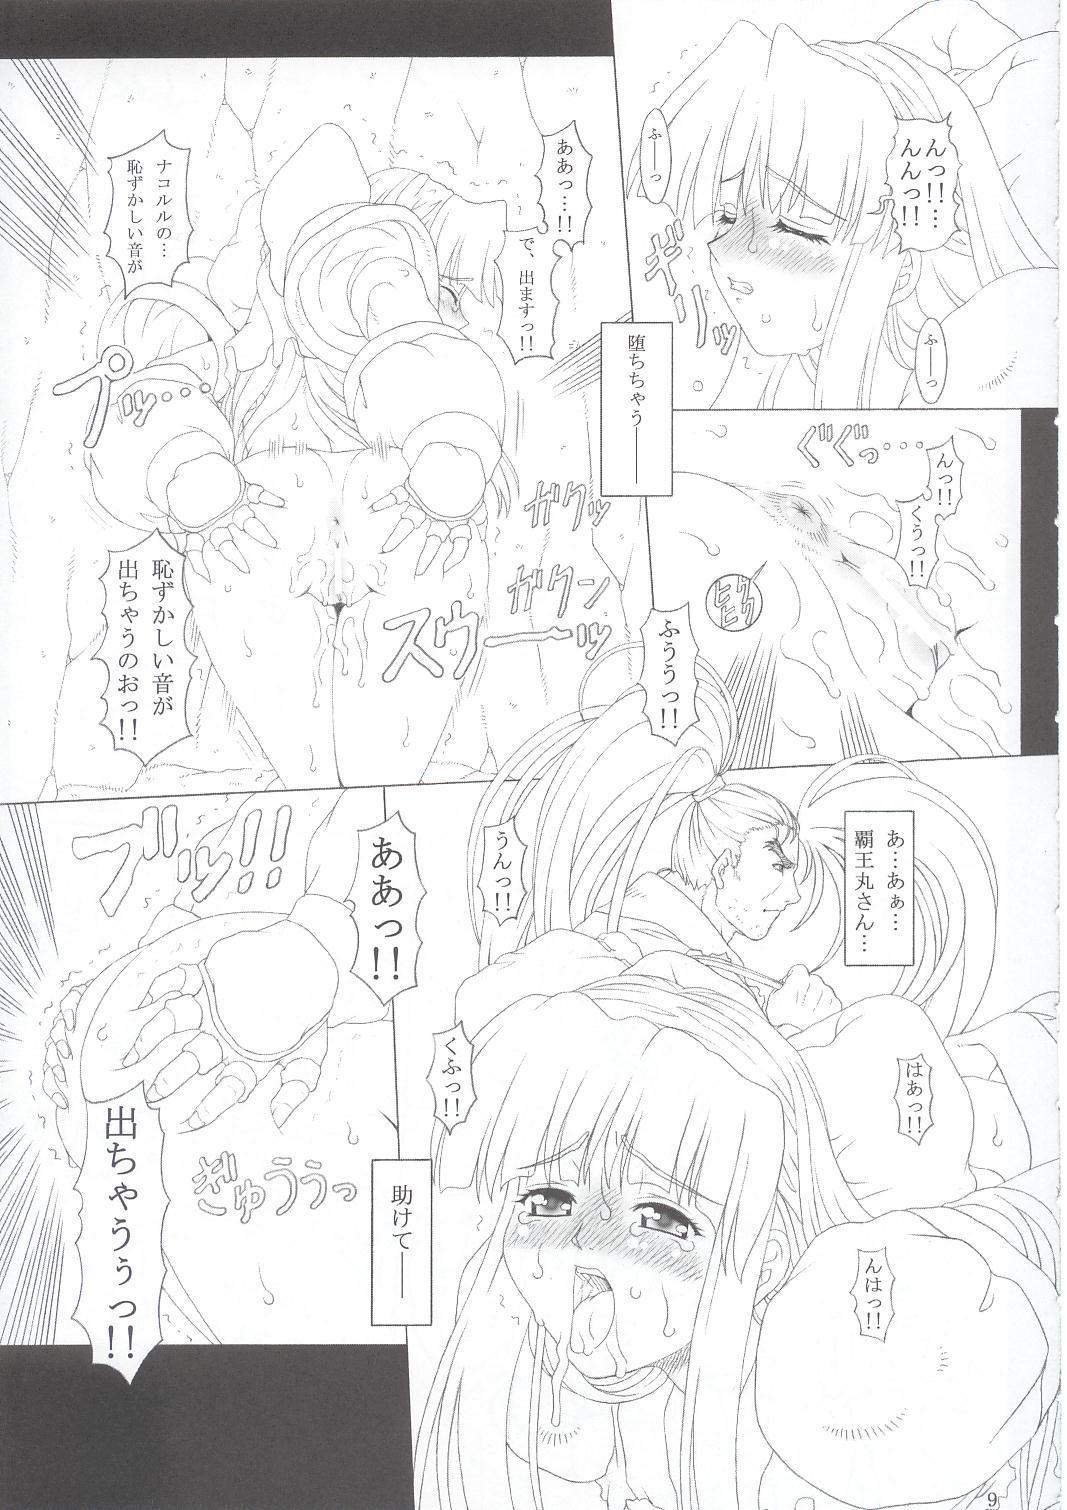 JUNK Dain no Miko San 7